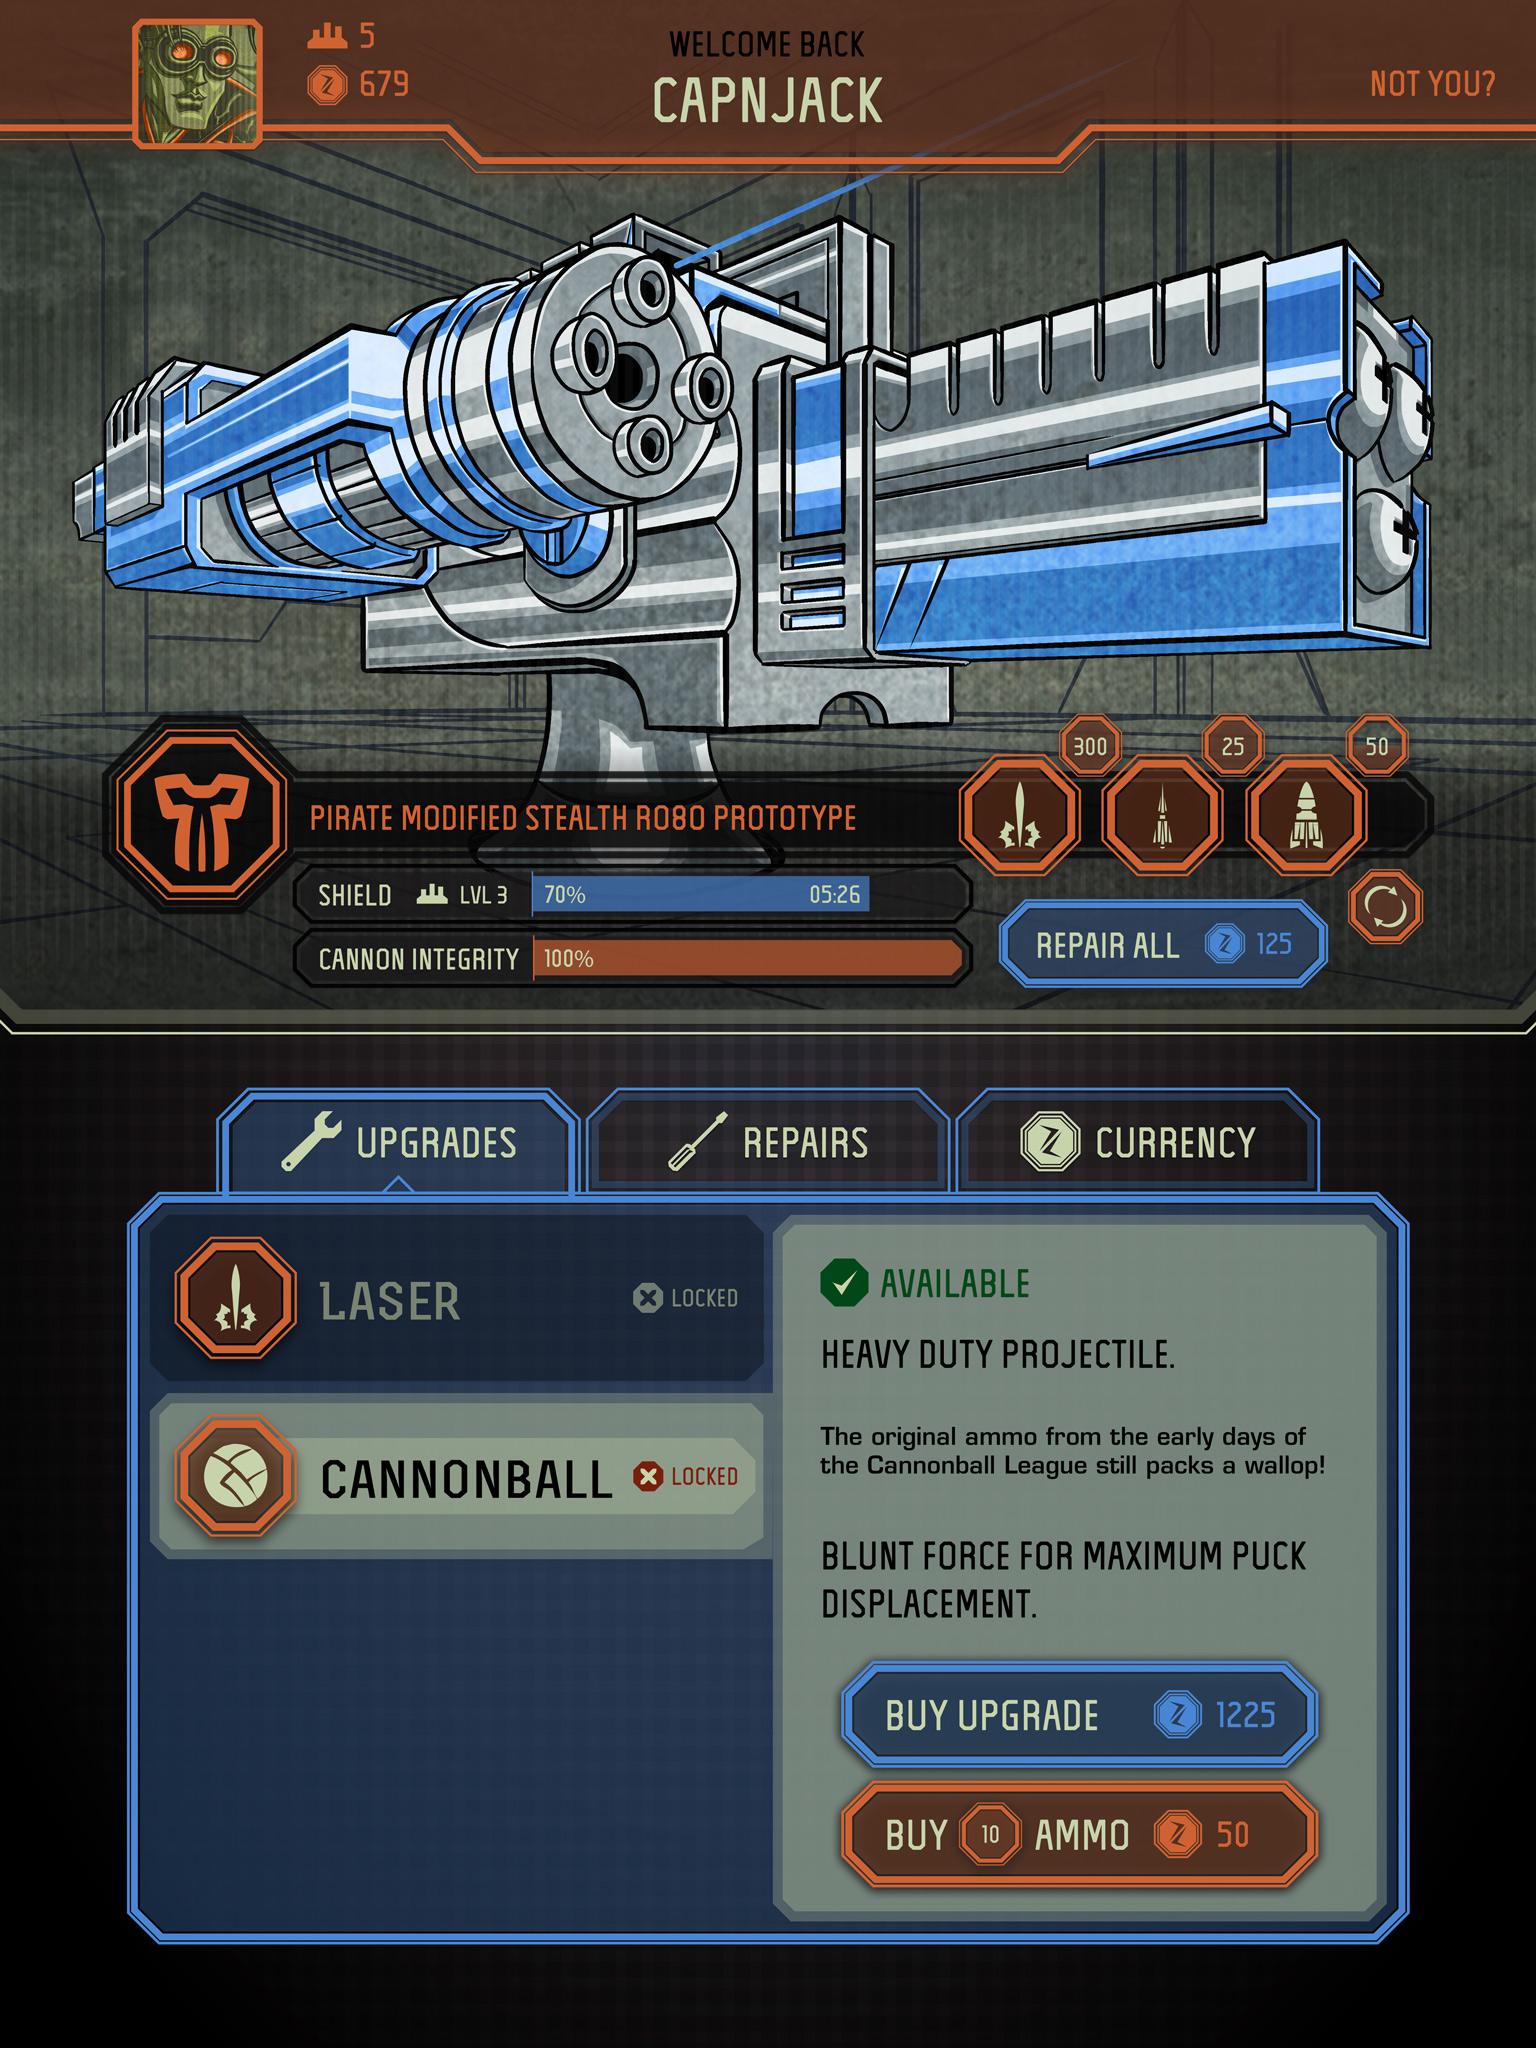 CannonPortrait_Ro8o_FullUpgrades_MachineGuns.jpg